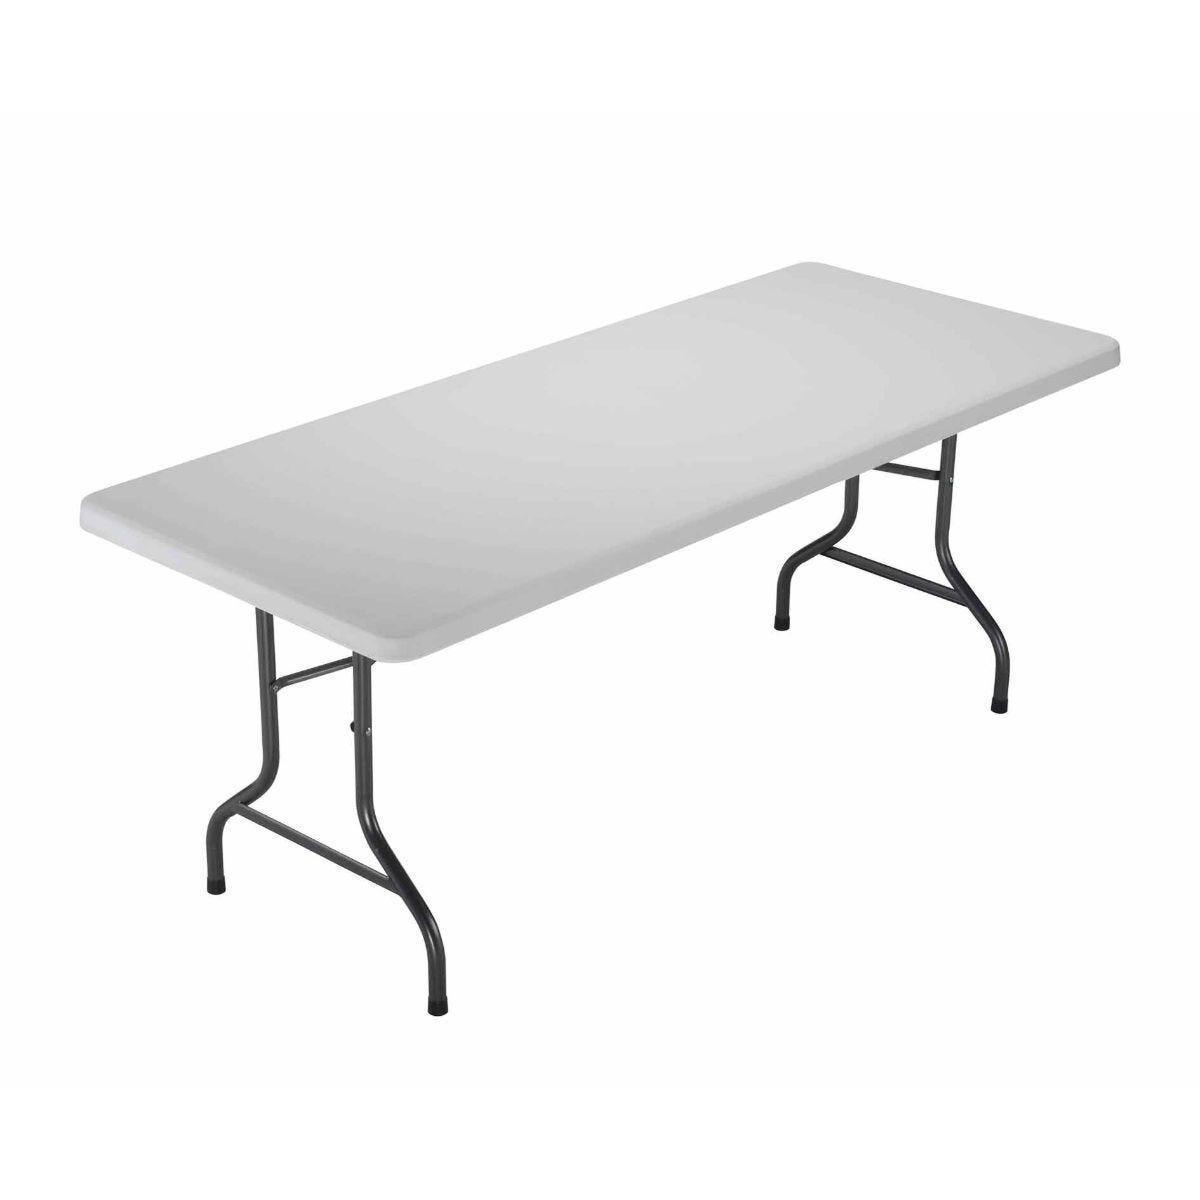 TC Office Morph Rectangular Polypropylene Folding Table 1820mm